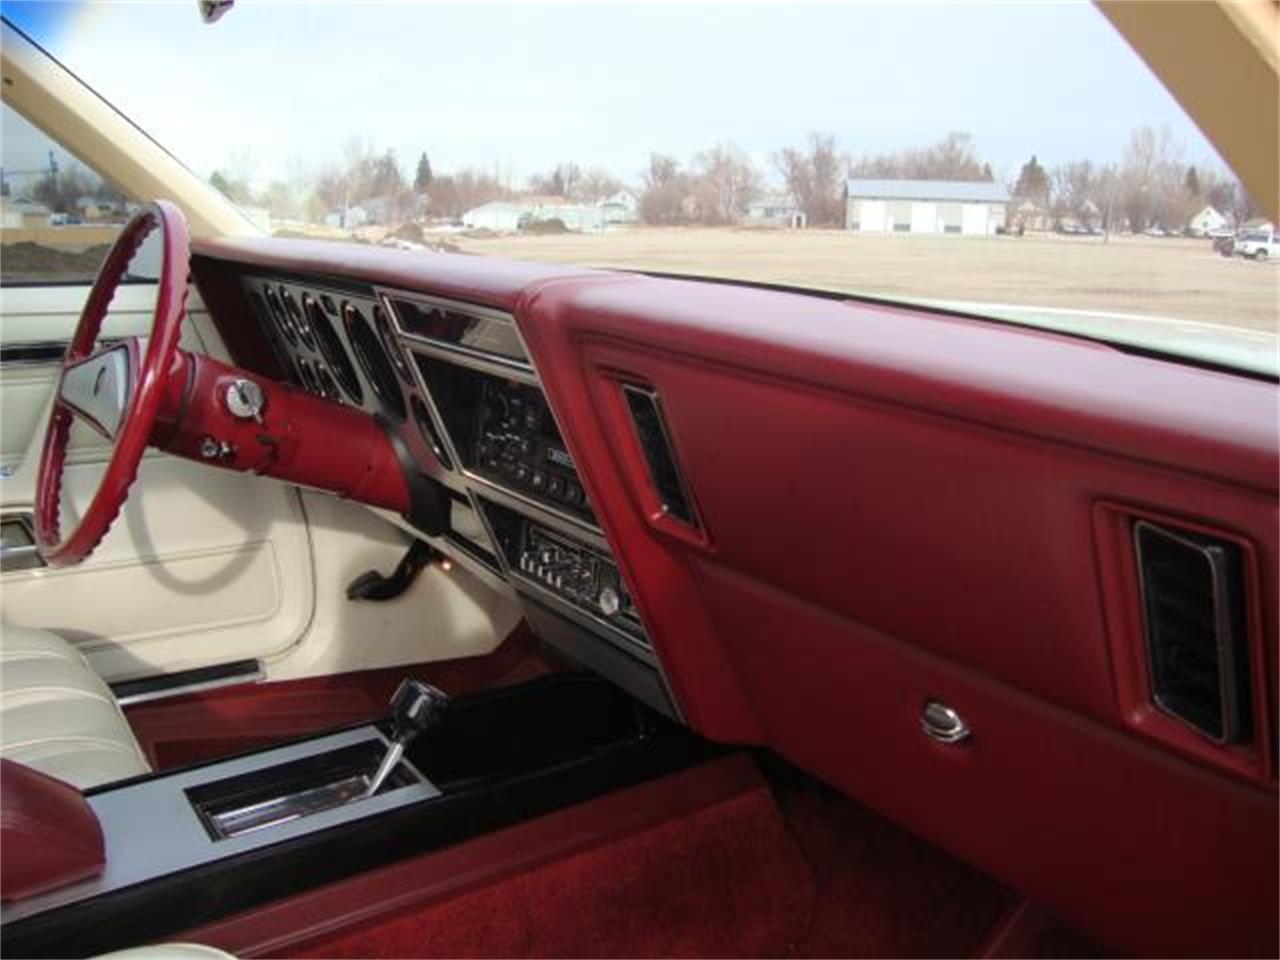 1980 Dodge Mirada For Sale Cc 1058269 Interior Large Picture Of 80 Mokd